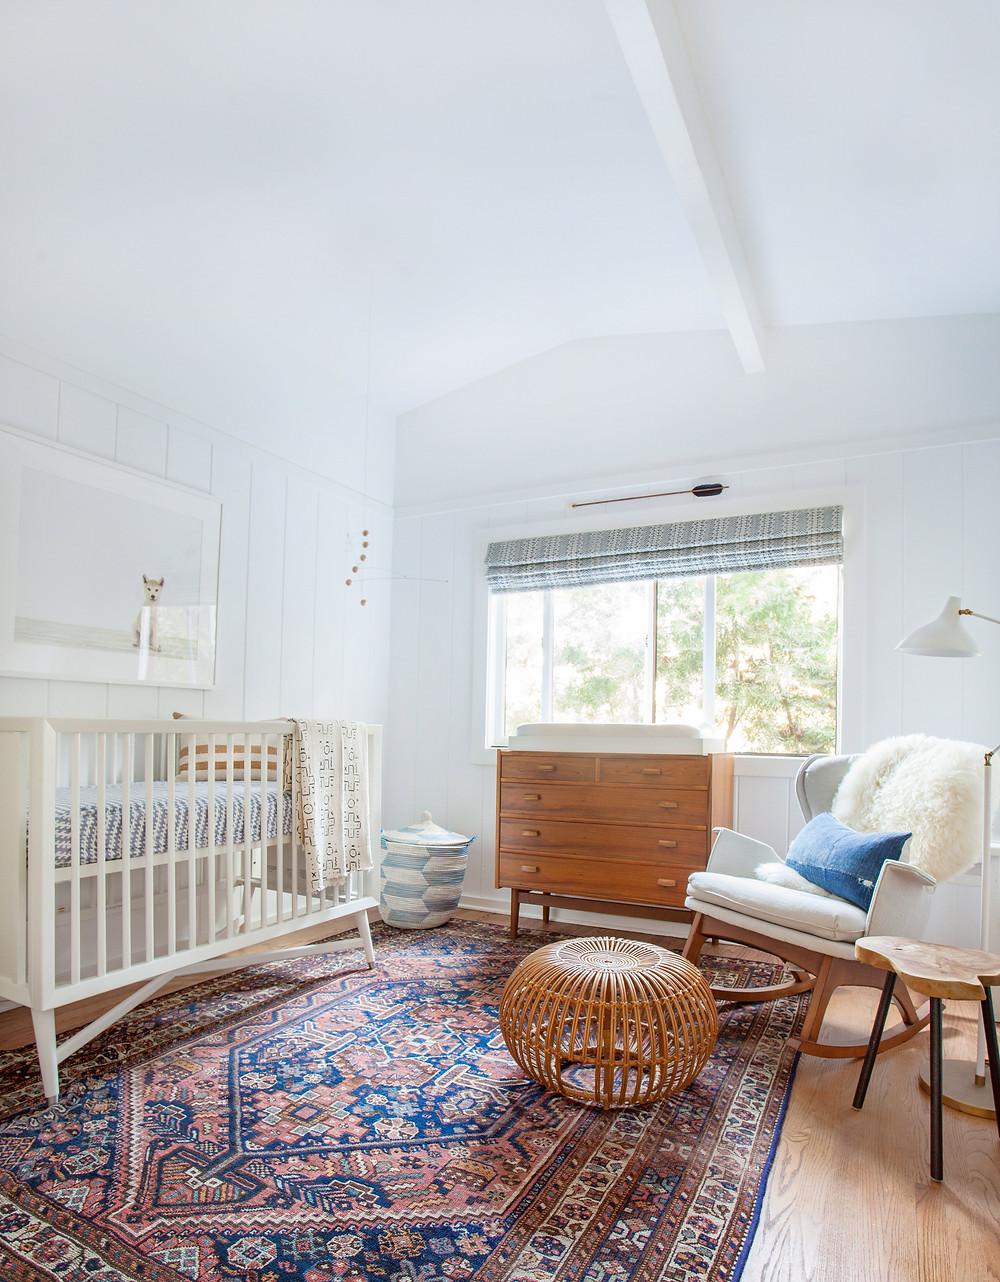 lumbar cushion, indigo, batik, vintage, ethnic, scandinavian, interior design, nursery, ethical, homewares, lifestyle, artisan